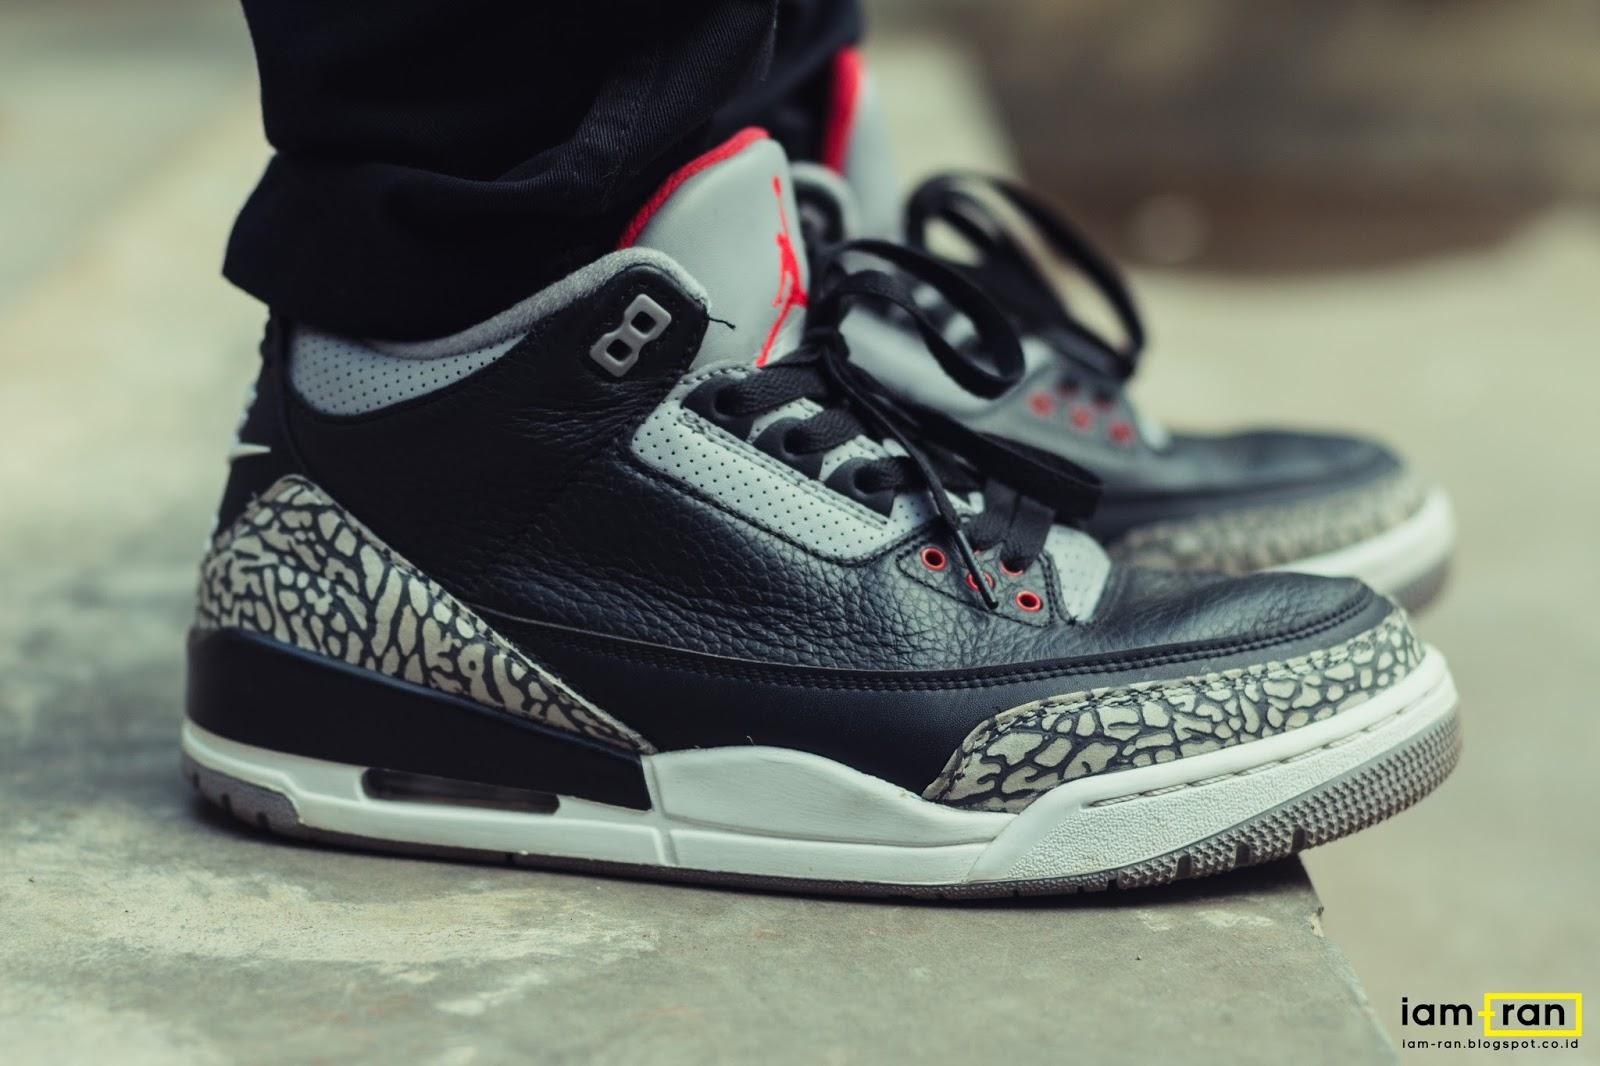 1671aaf7587d4d IAM-RAN  ON FEET   Rhyme on - Nike Air Jordan 3